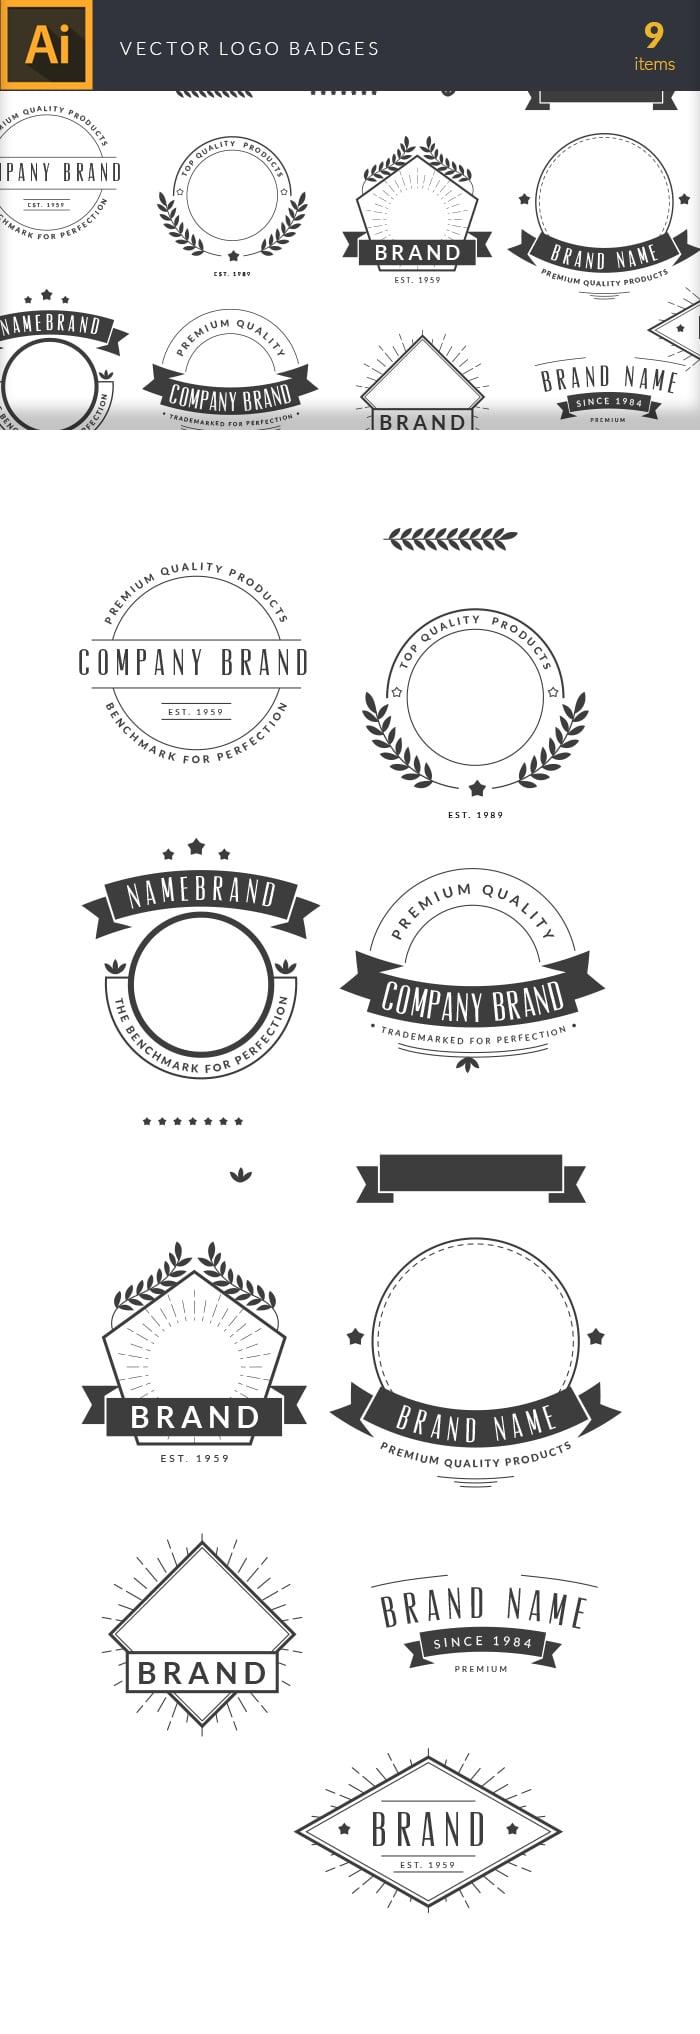 The Best Mega Graphics Bundle. 1000+ Premium Items for $49 - vector logo badges large1